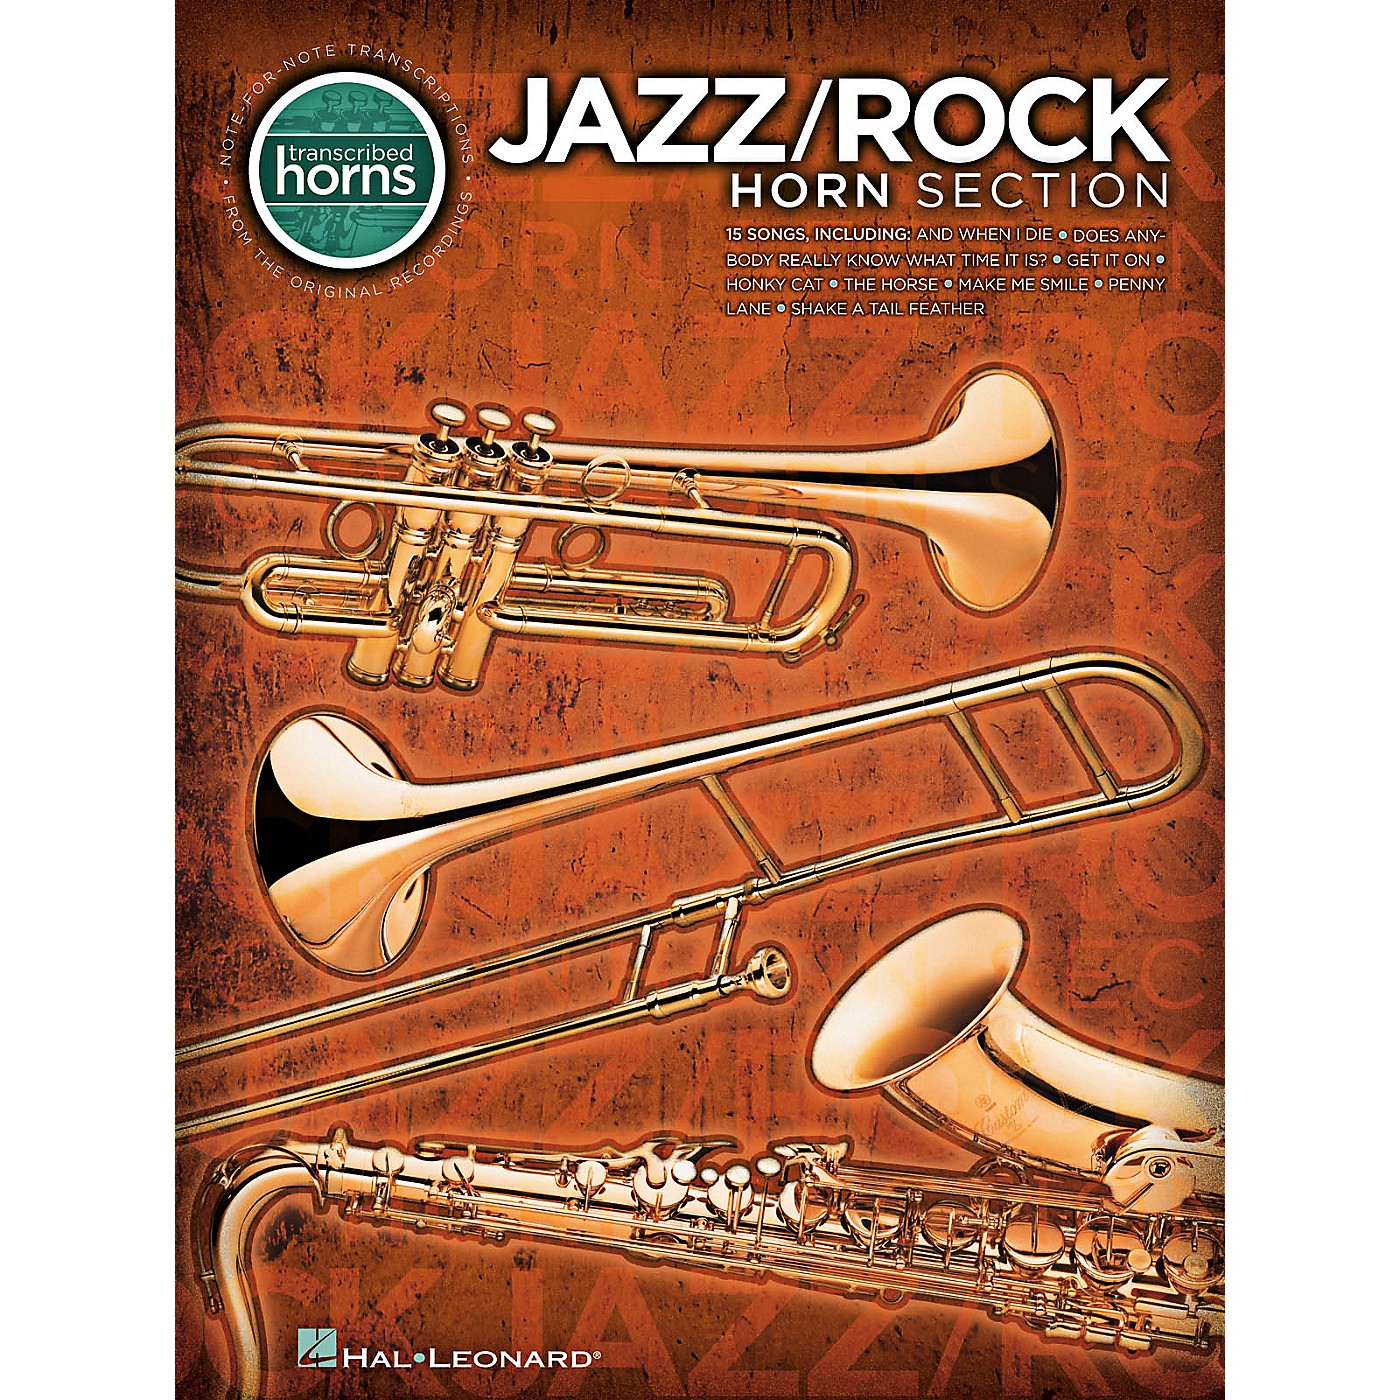 Hal Leonard Jazz/Rock Horn Section - Transcribed Horn Songbook thumbnail